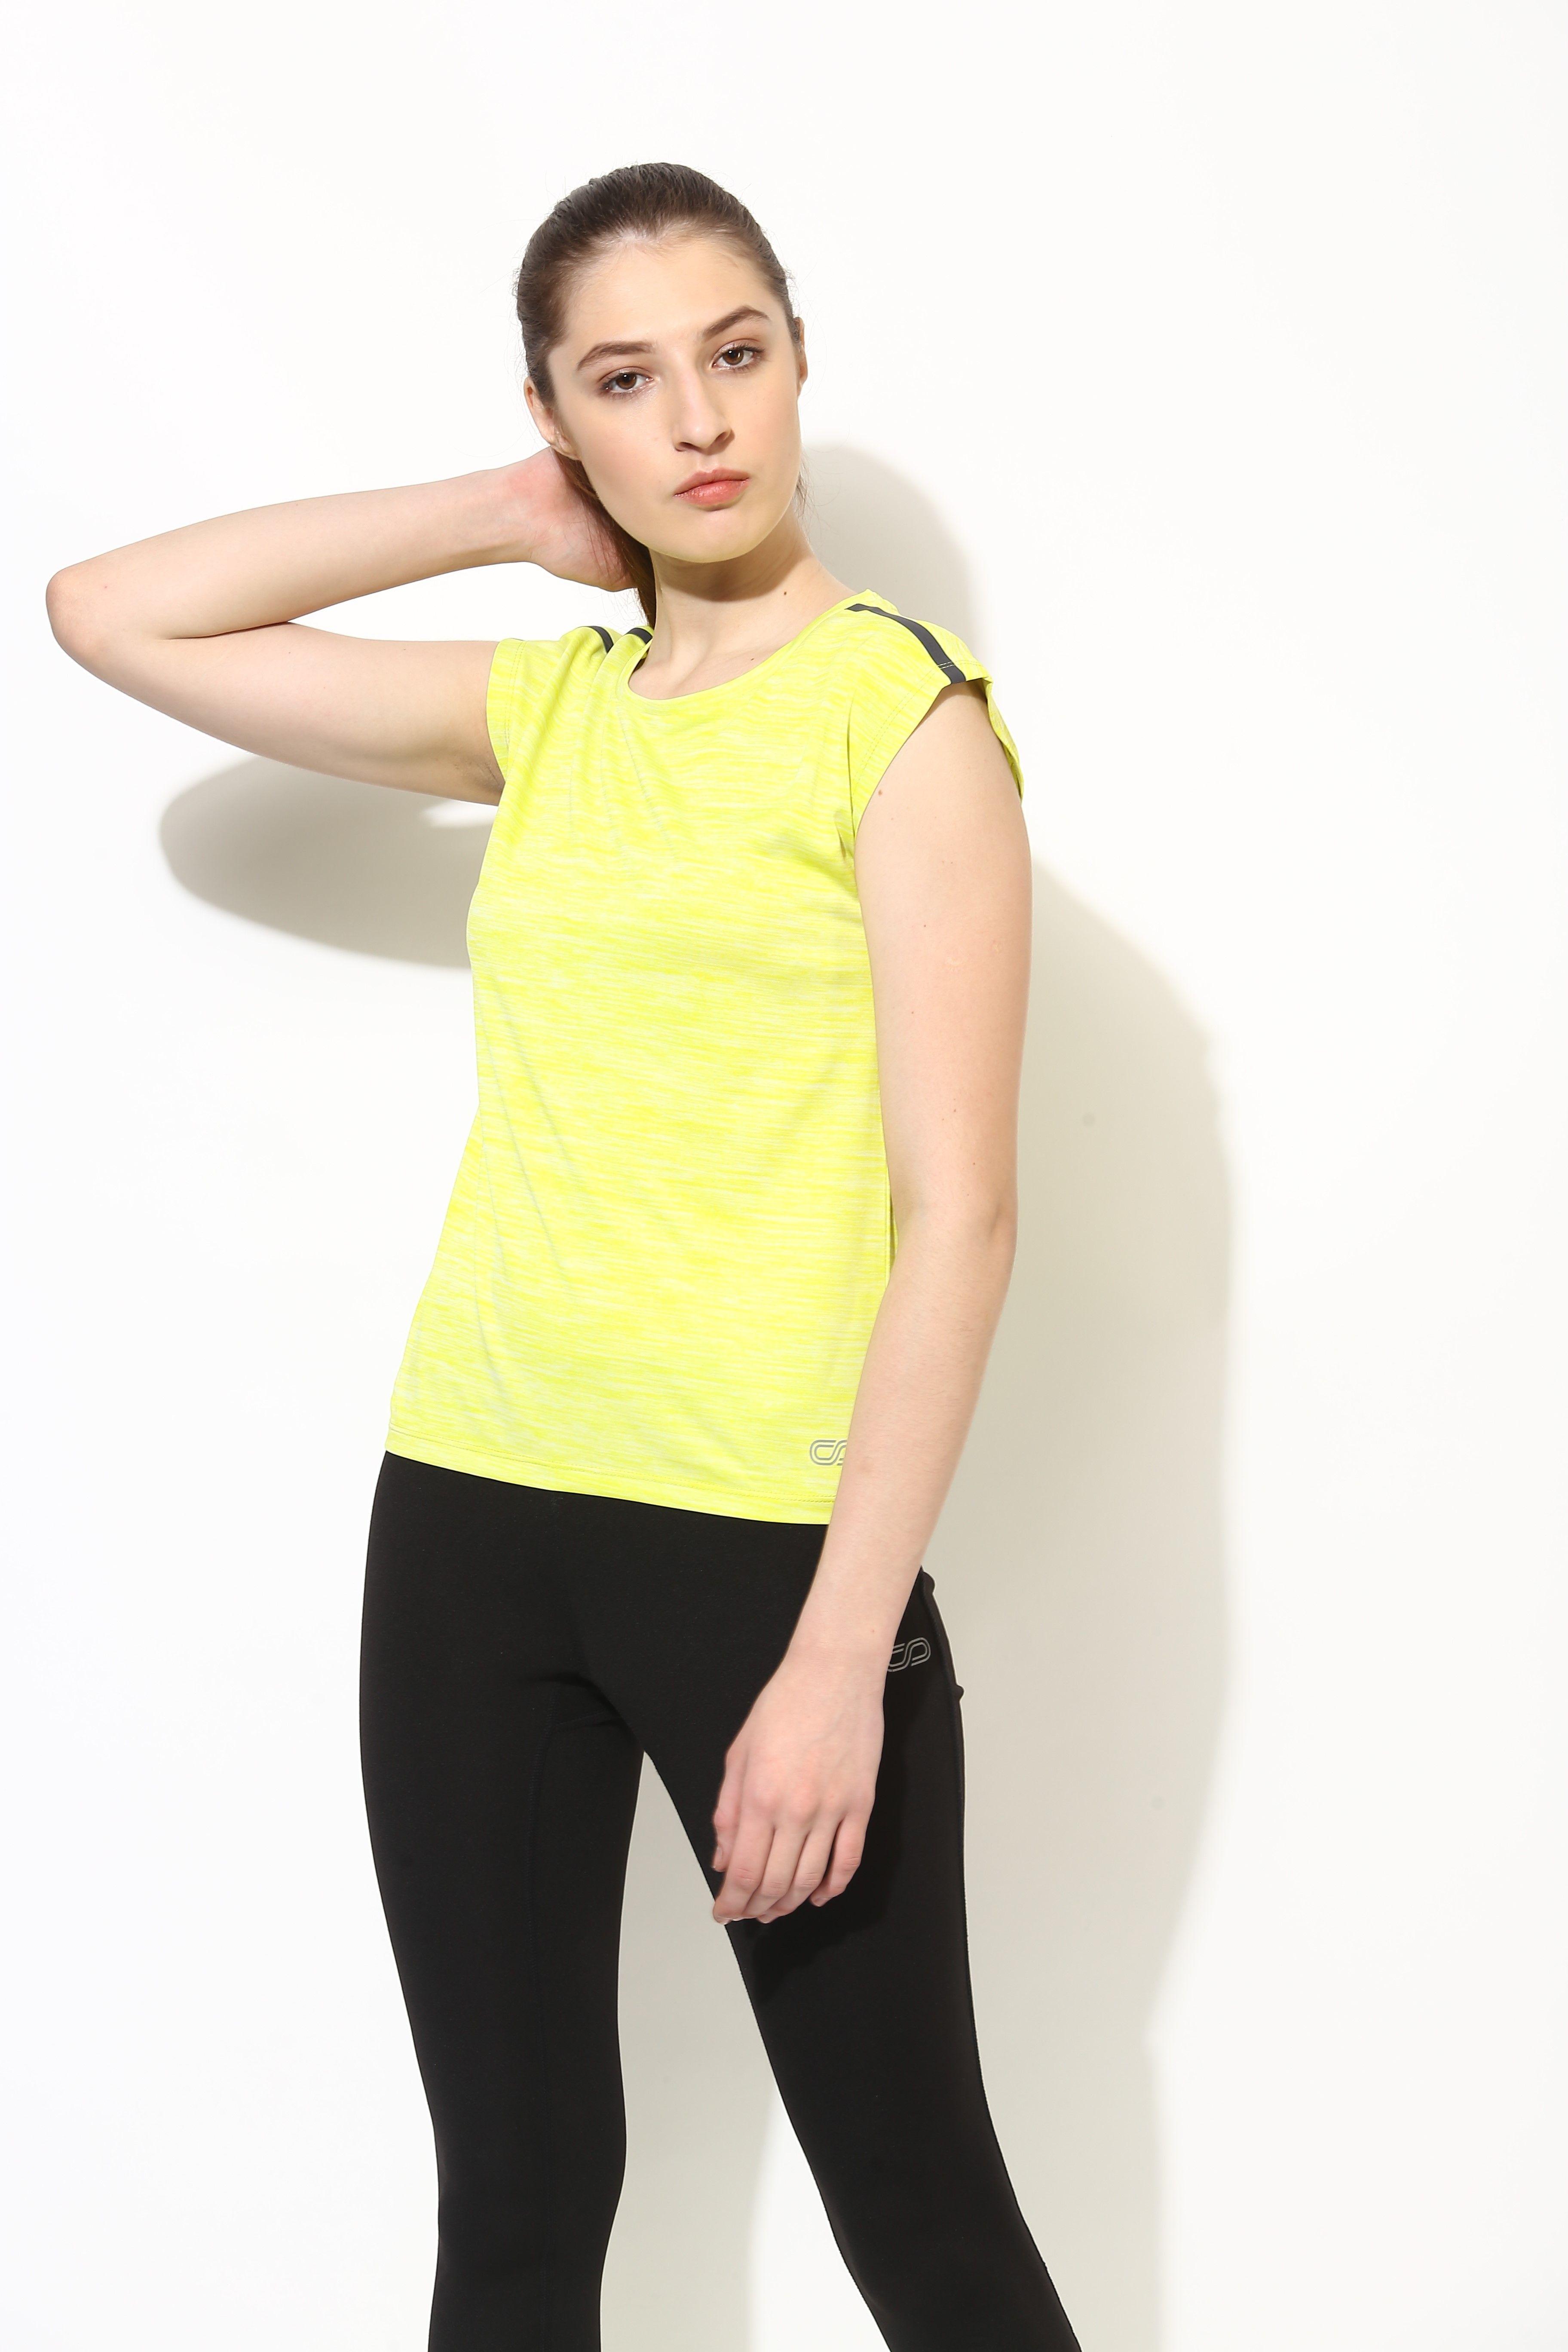 SILVERTRAQ WOMEN S RELAX FIT T-SHIRT Shop Online in India Wicking  Sportswear Top. Women s Fitness 65d186ac27